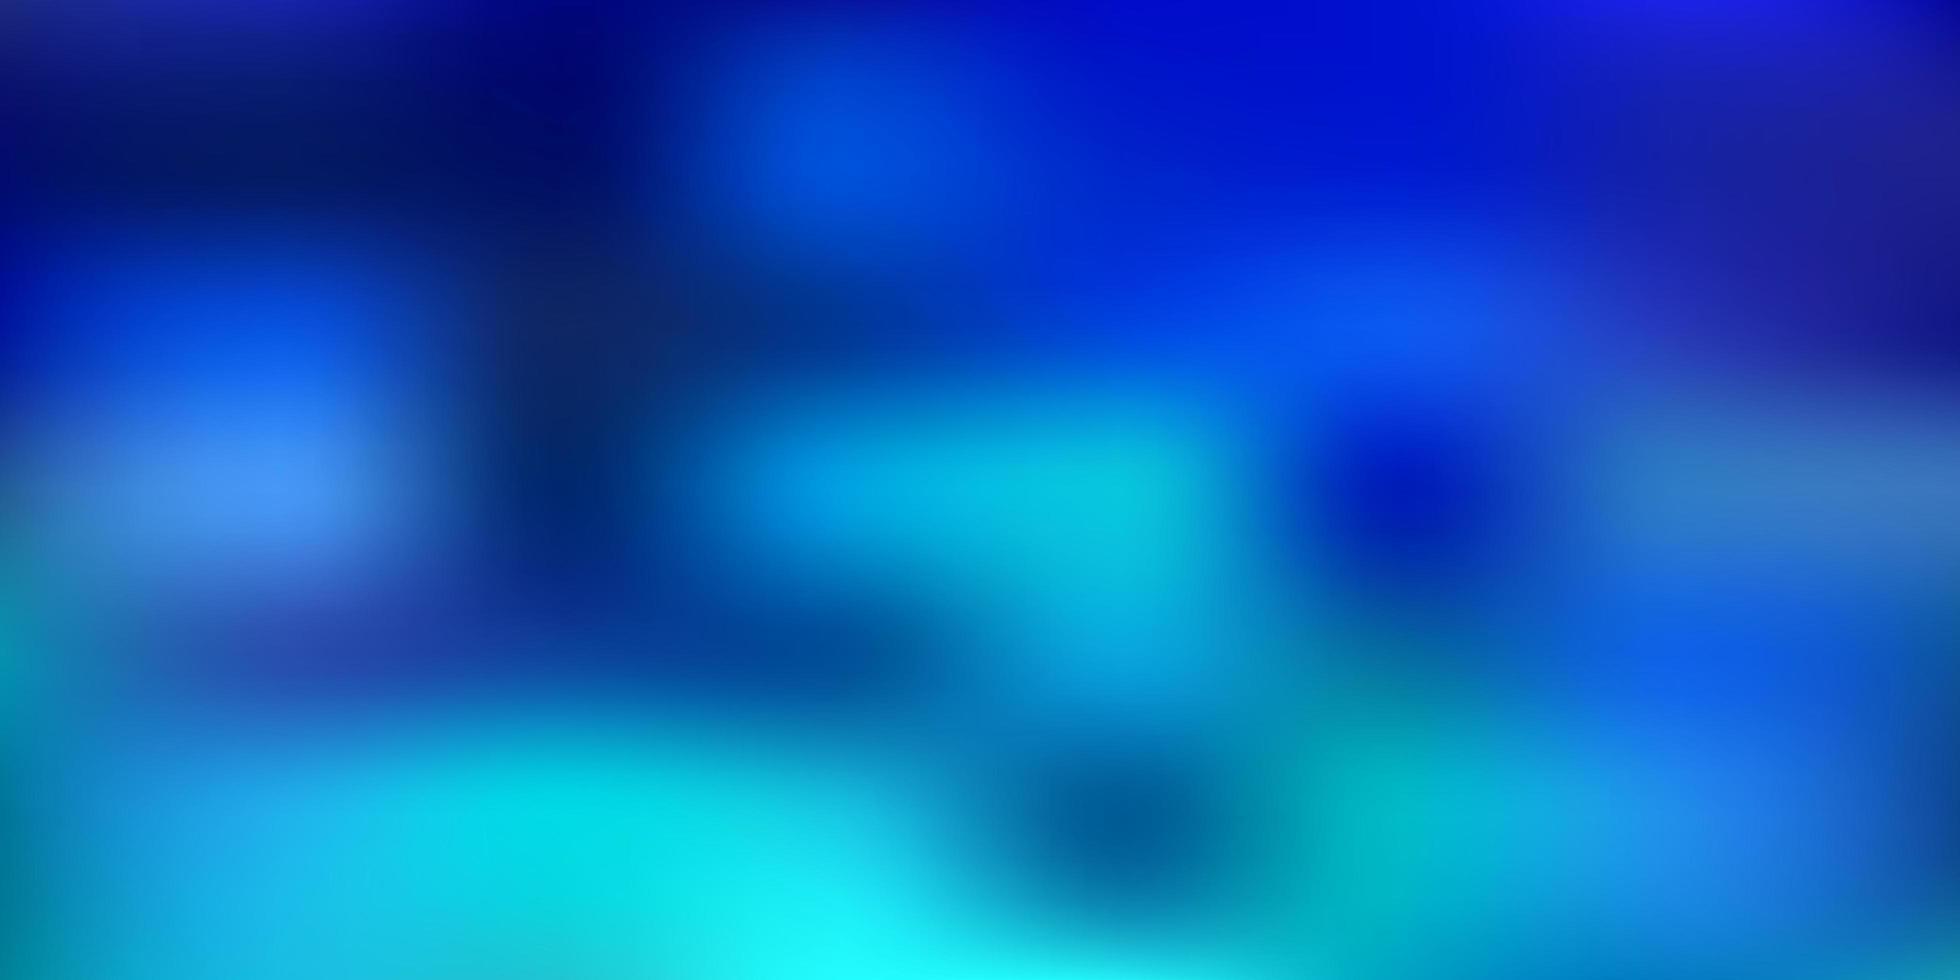 patrón de desenfoque de vector azul claro.